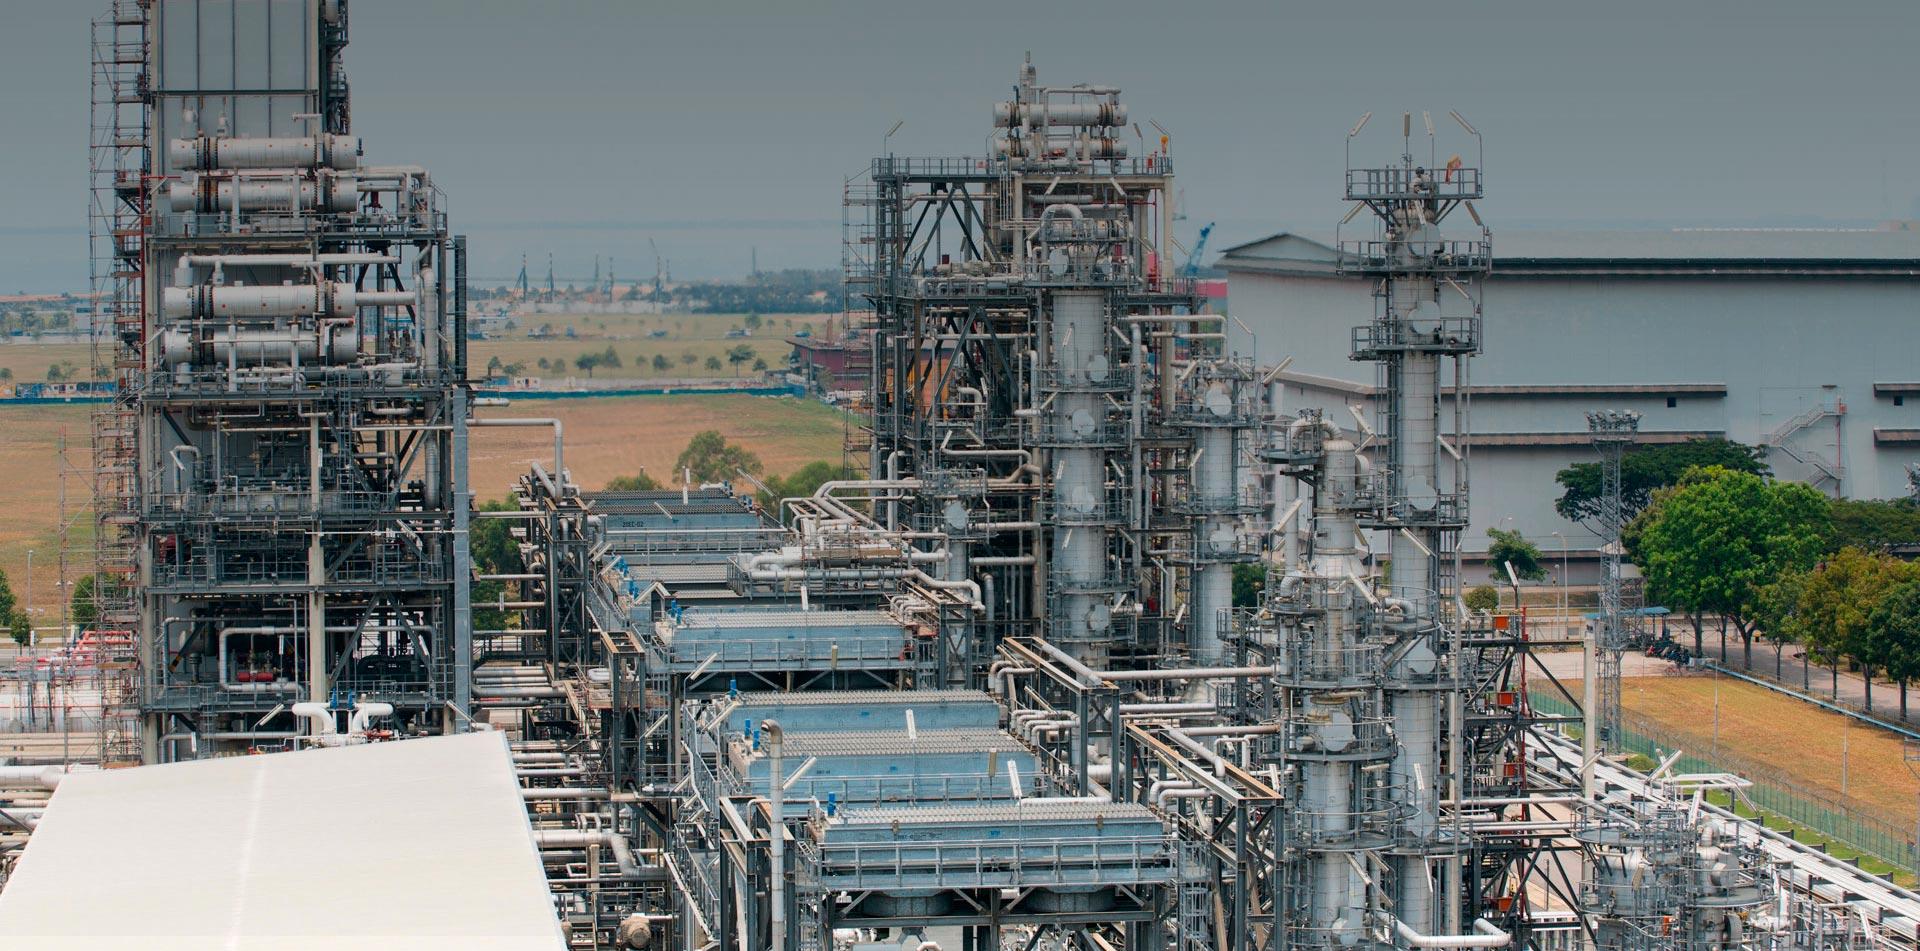 Проект The World's largest renewable bio-diesel plant